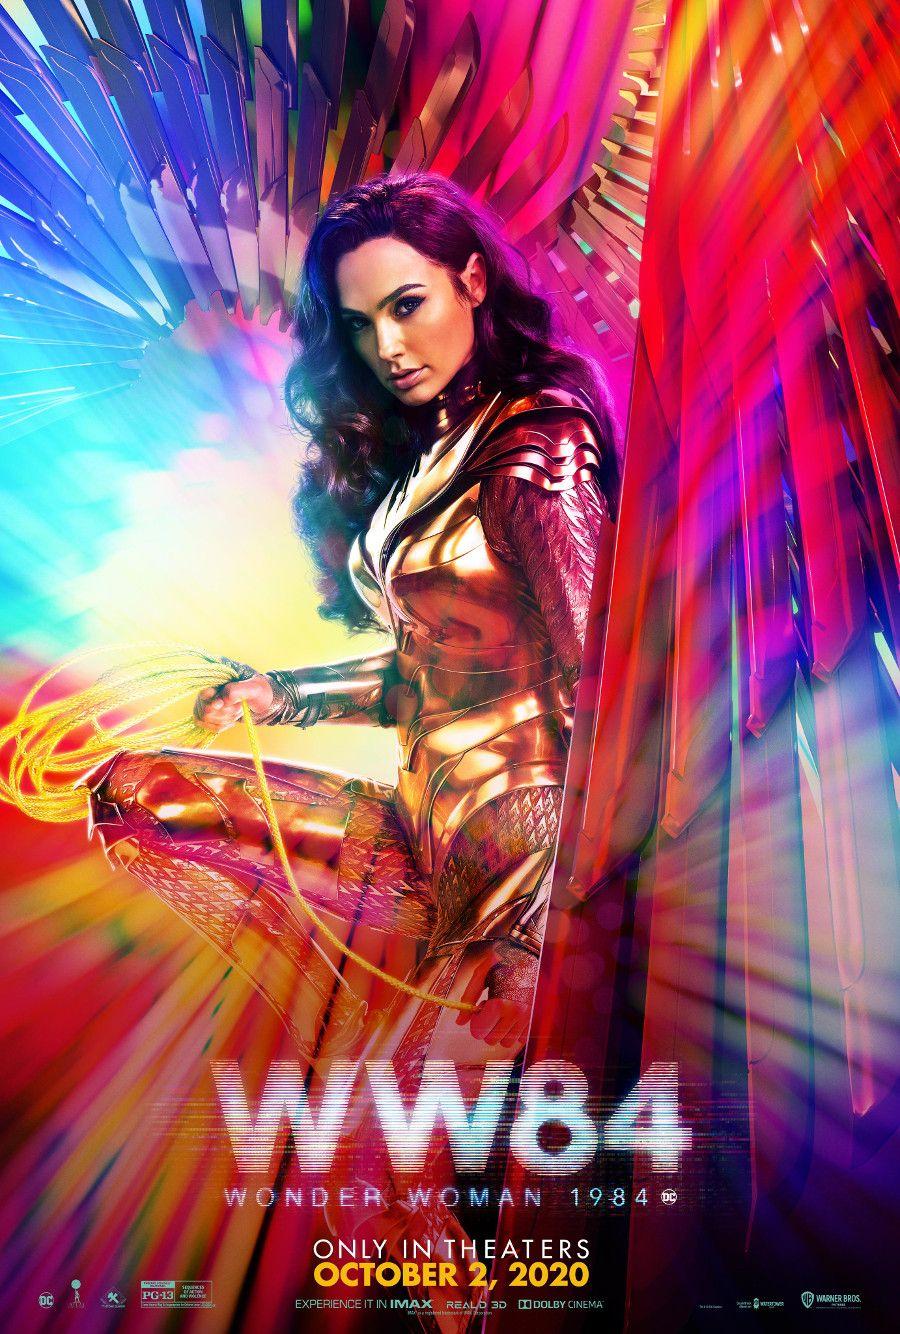 Gal Gadot Wonder Woman 1984 Poster Sports New October Release Date Cosmic Book News In 2020 Wonder Woman Gal Gadot Wonder Woman 1984 Movie